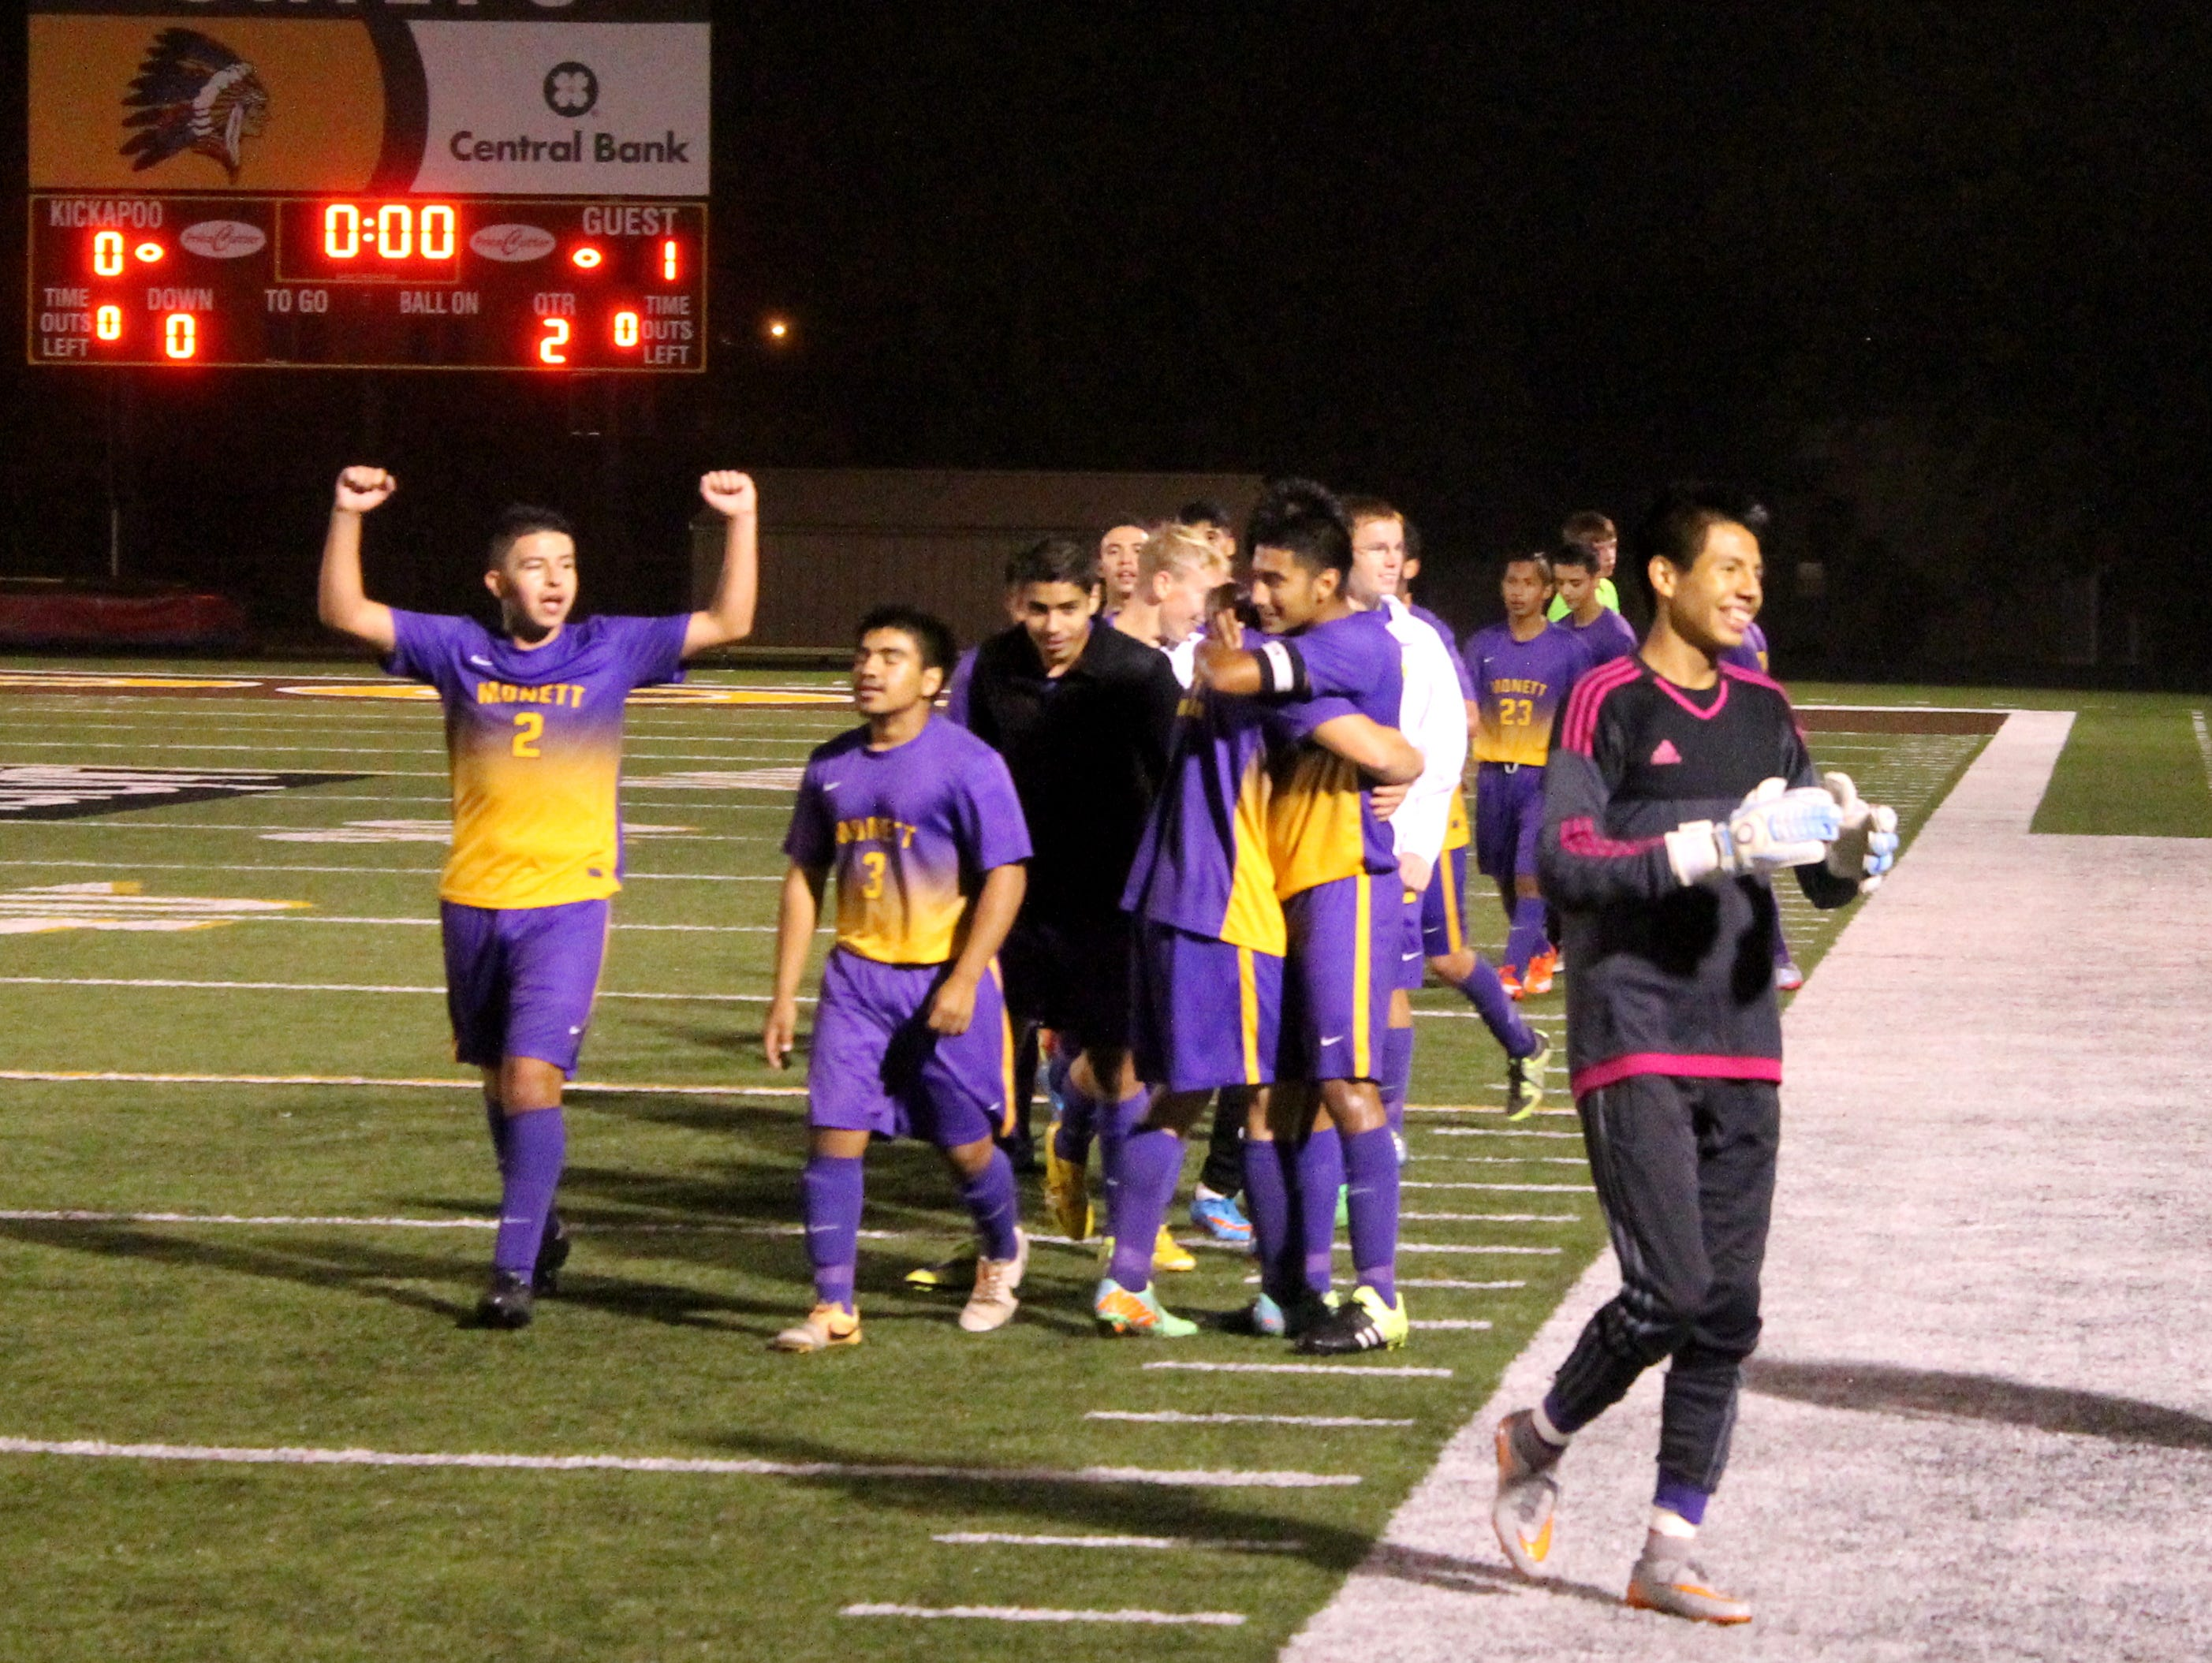 Members of the Monett High School boys soccer team celebrate a 1-0 playoff win over Springfield Catholic at Kickapoo's Pottenger Stadium on Oct. 27.